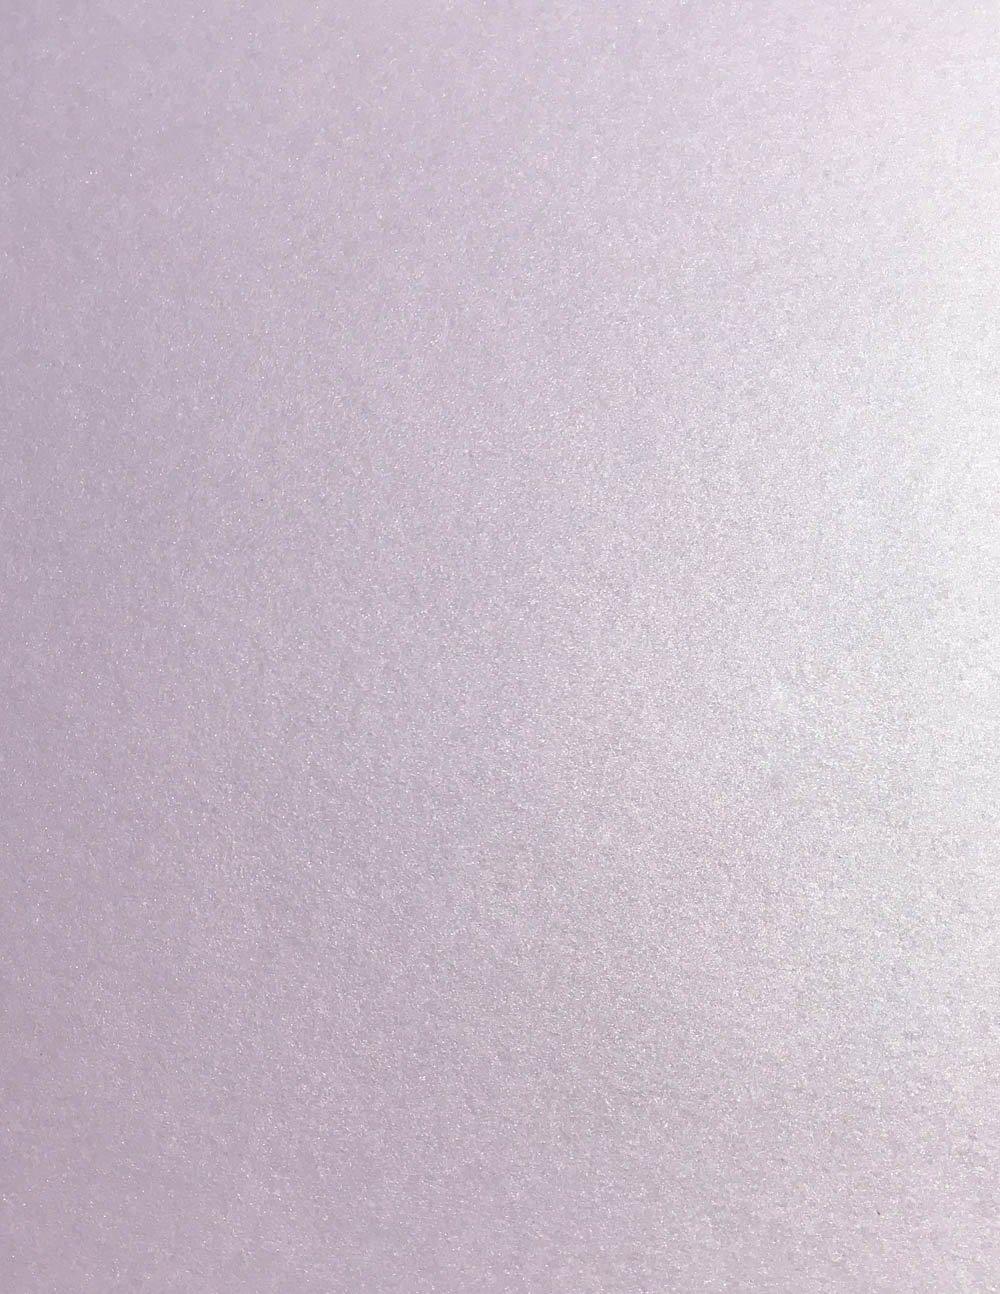 KUNZITE Stardream Metallic Cardstock 8.5'' X 11'' Premium 105 LB. Cover/284 GSM - 25 Sheets from Cardstock Warehouse